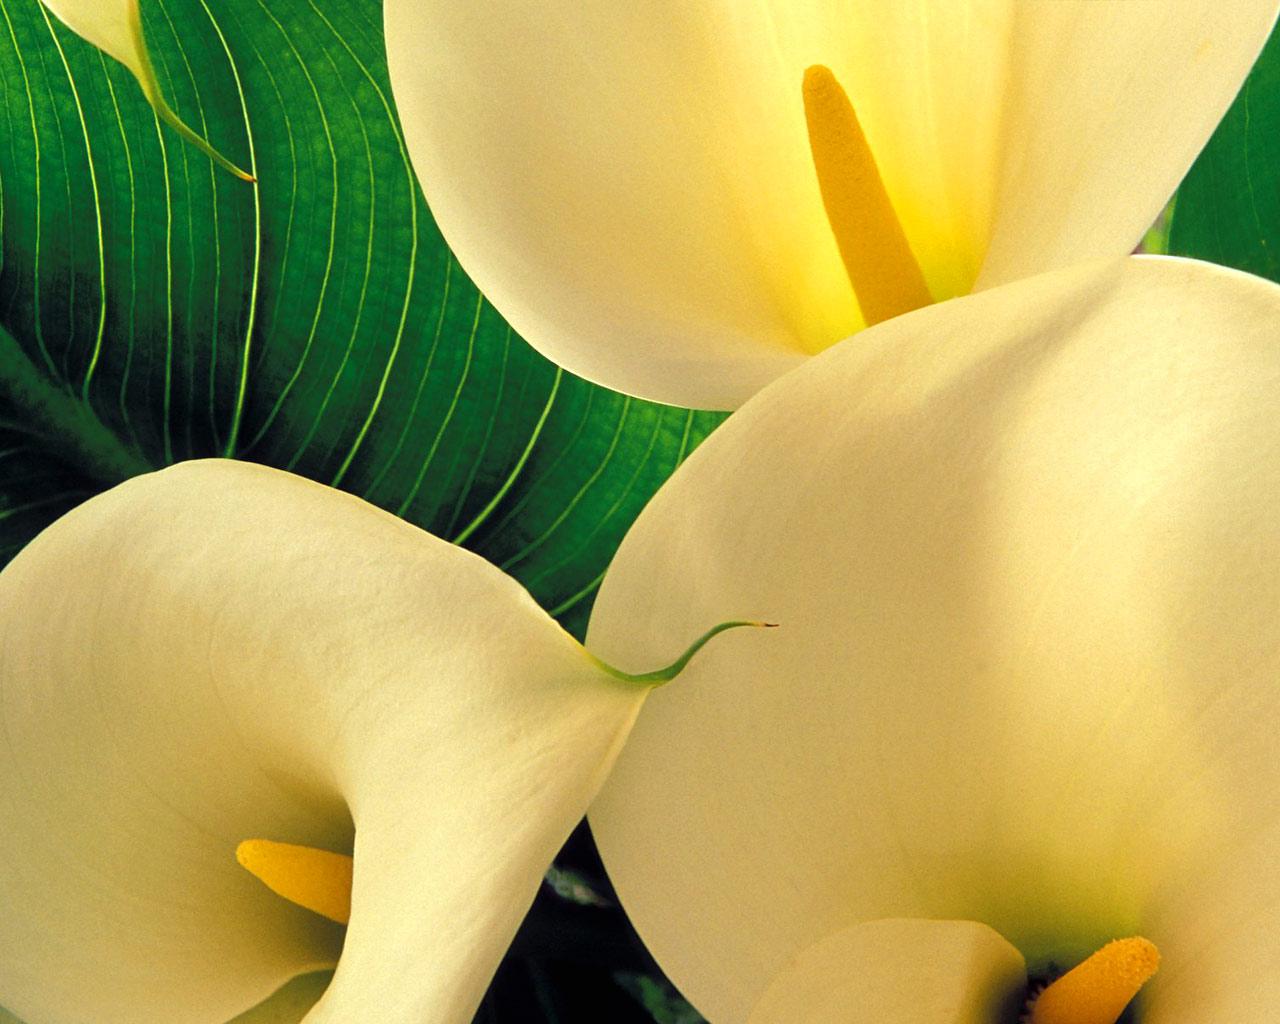 http://2.bp.blogspot.com/-N1wYHyk_AZA/TePe-_SNo-I/AAAAAAAAAC4/8LdhKshagH4/s1600/Yellow+Calla+Lilies-Flowers-Wallpapers.jpg